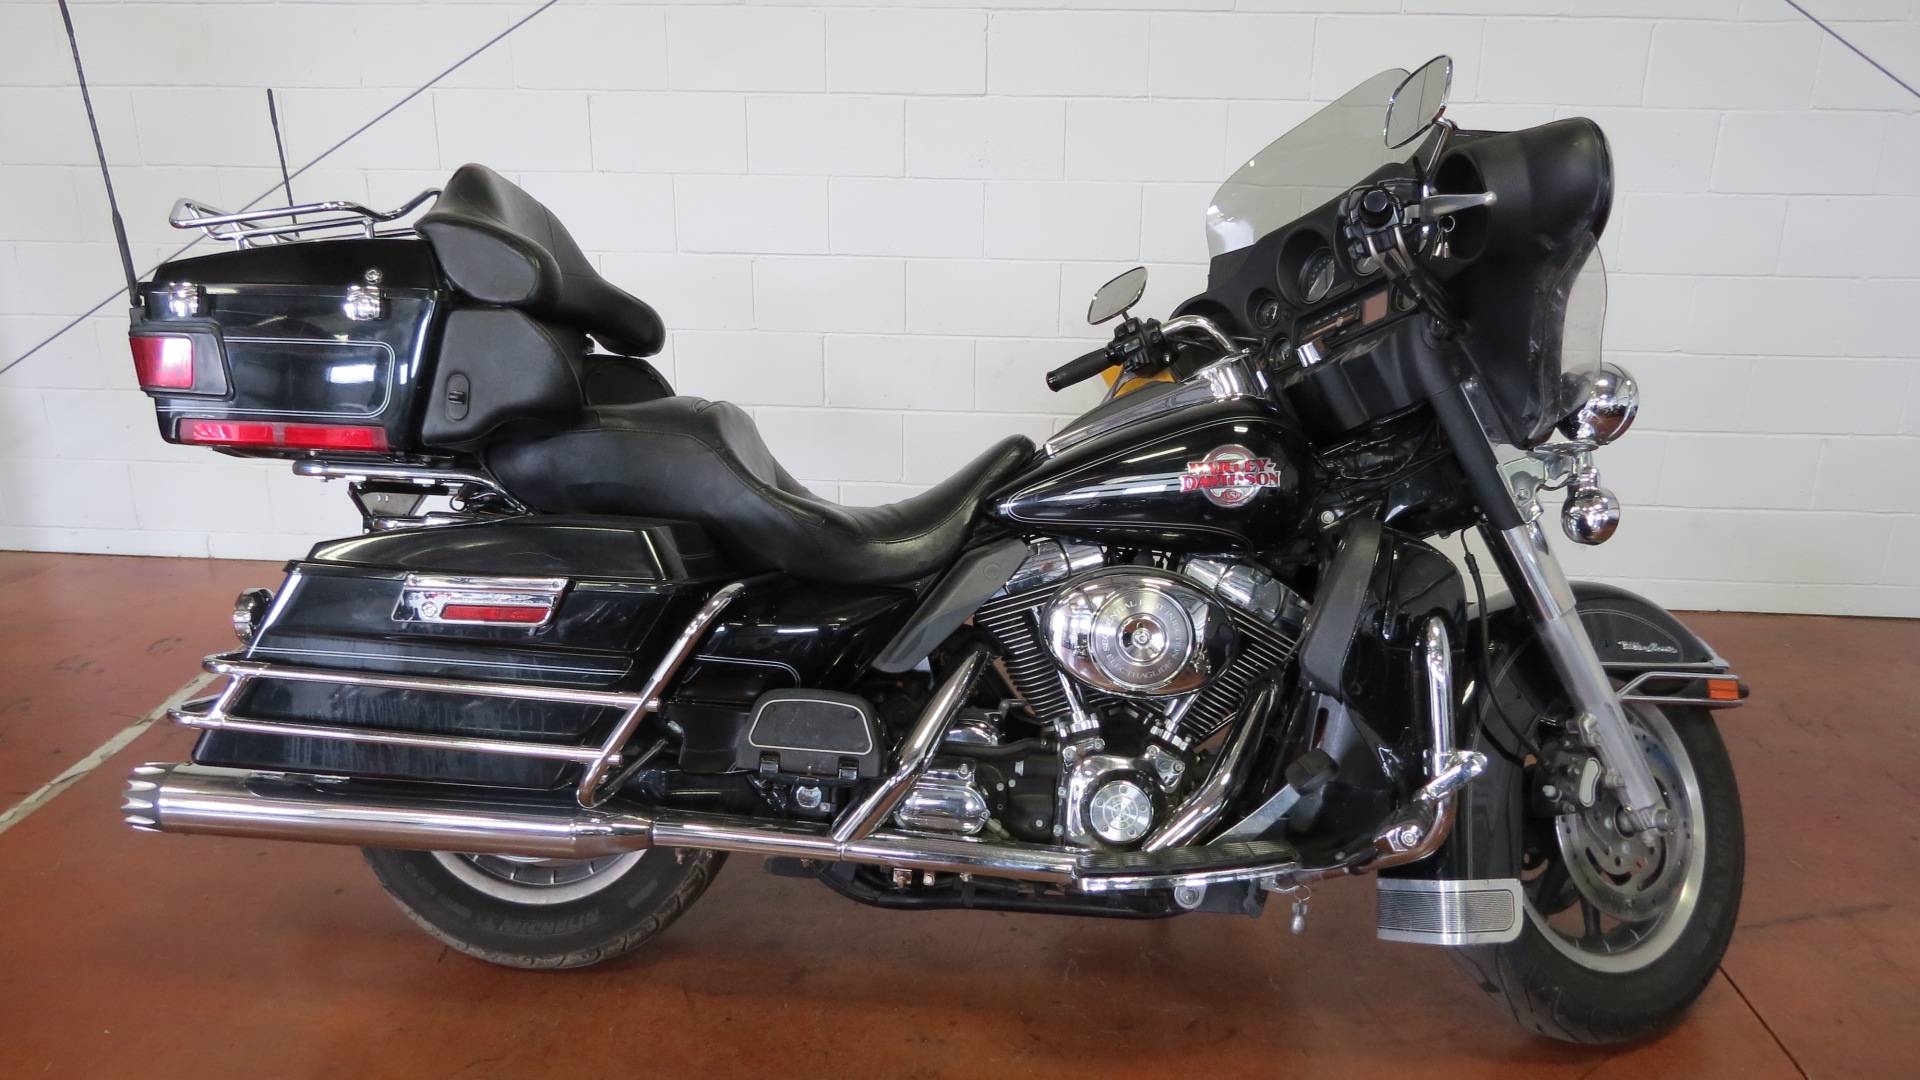 2005 Harley Davidson >> 2005 Harley Davidson Flhtcui Ultra Classic Electra Glide In Sunbury Ohio